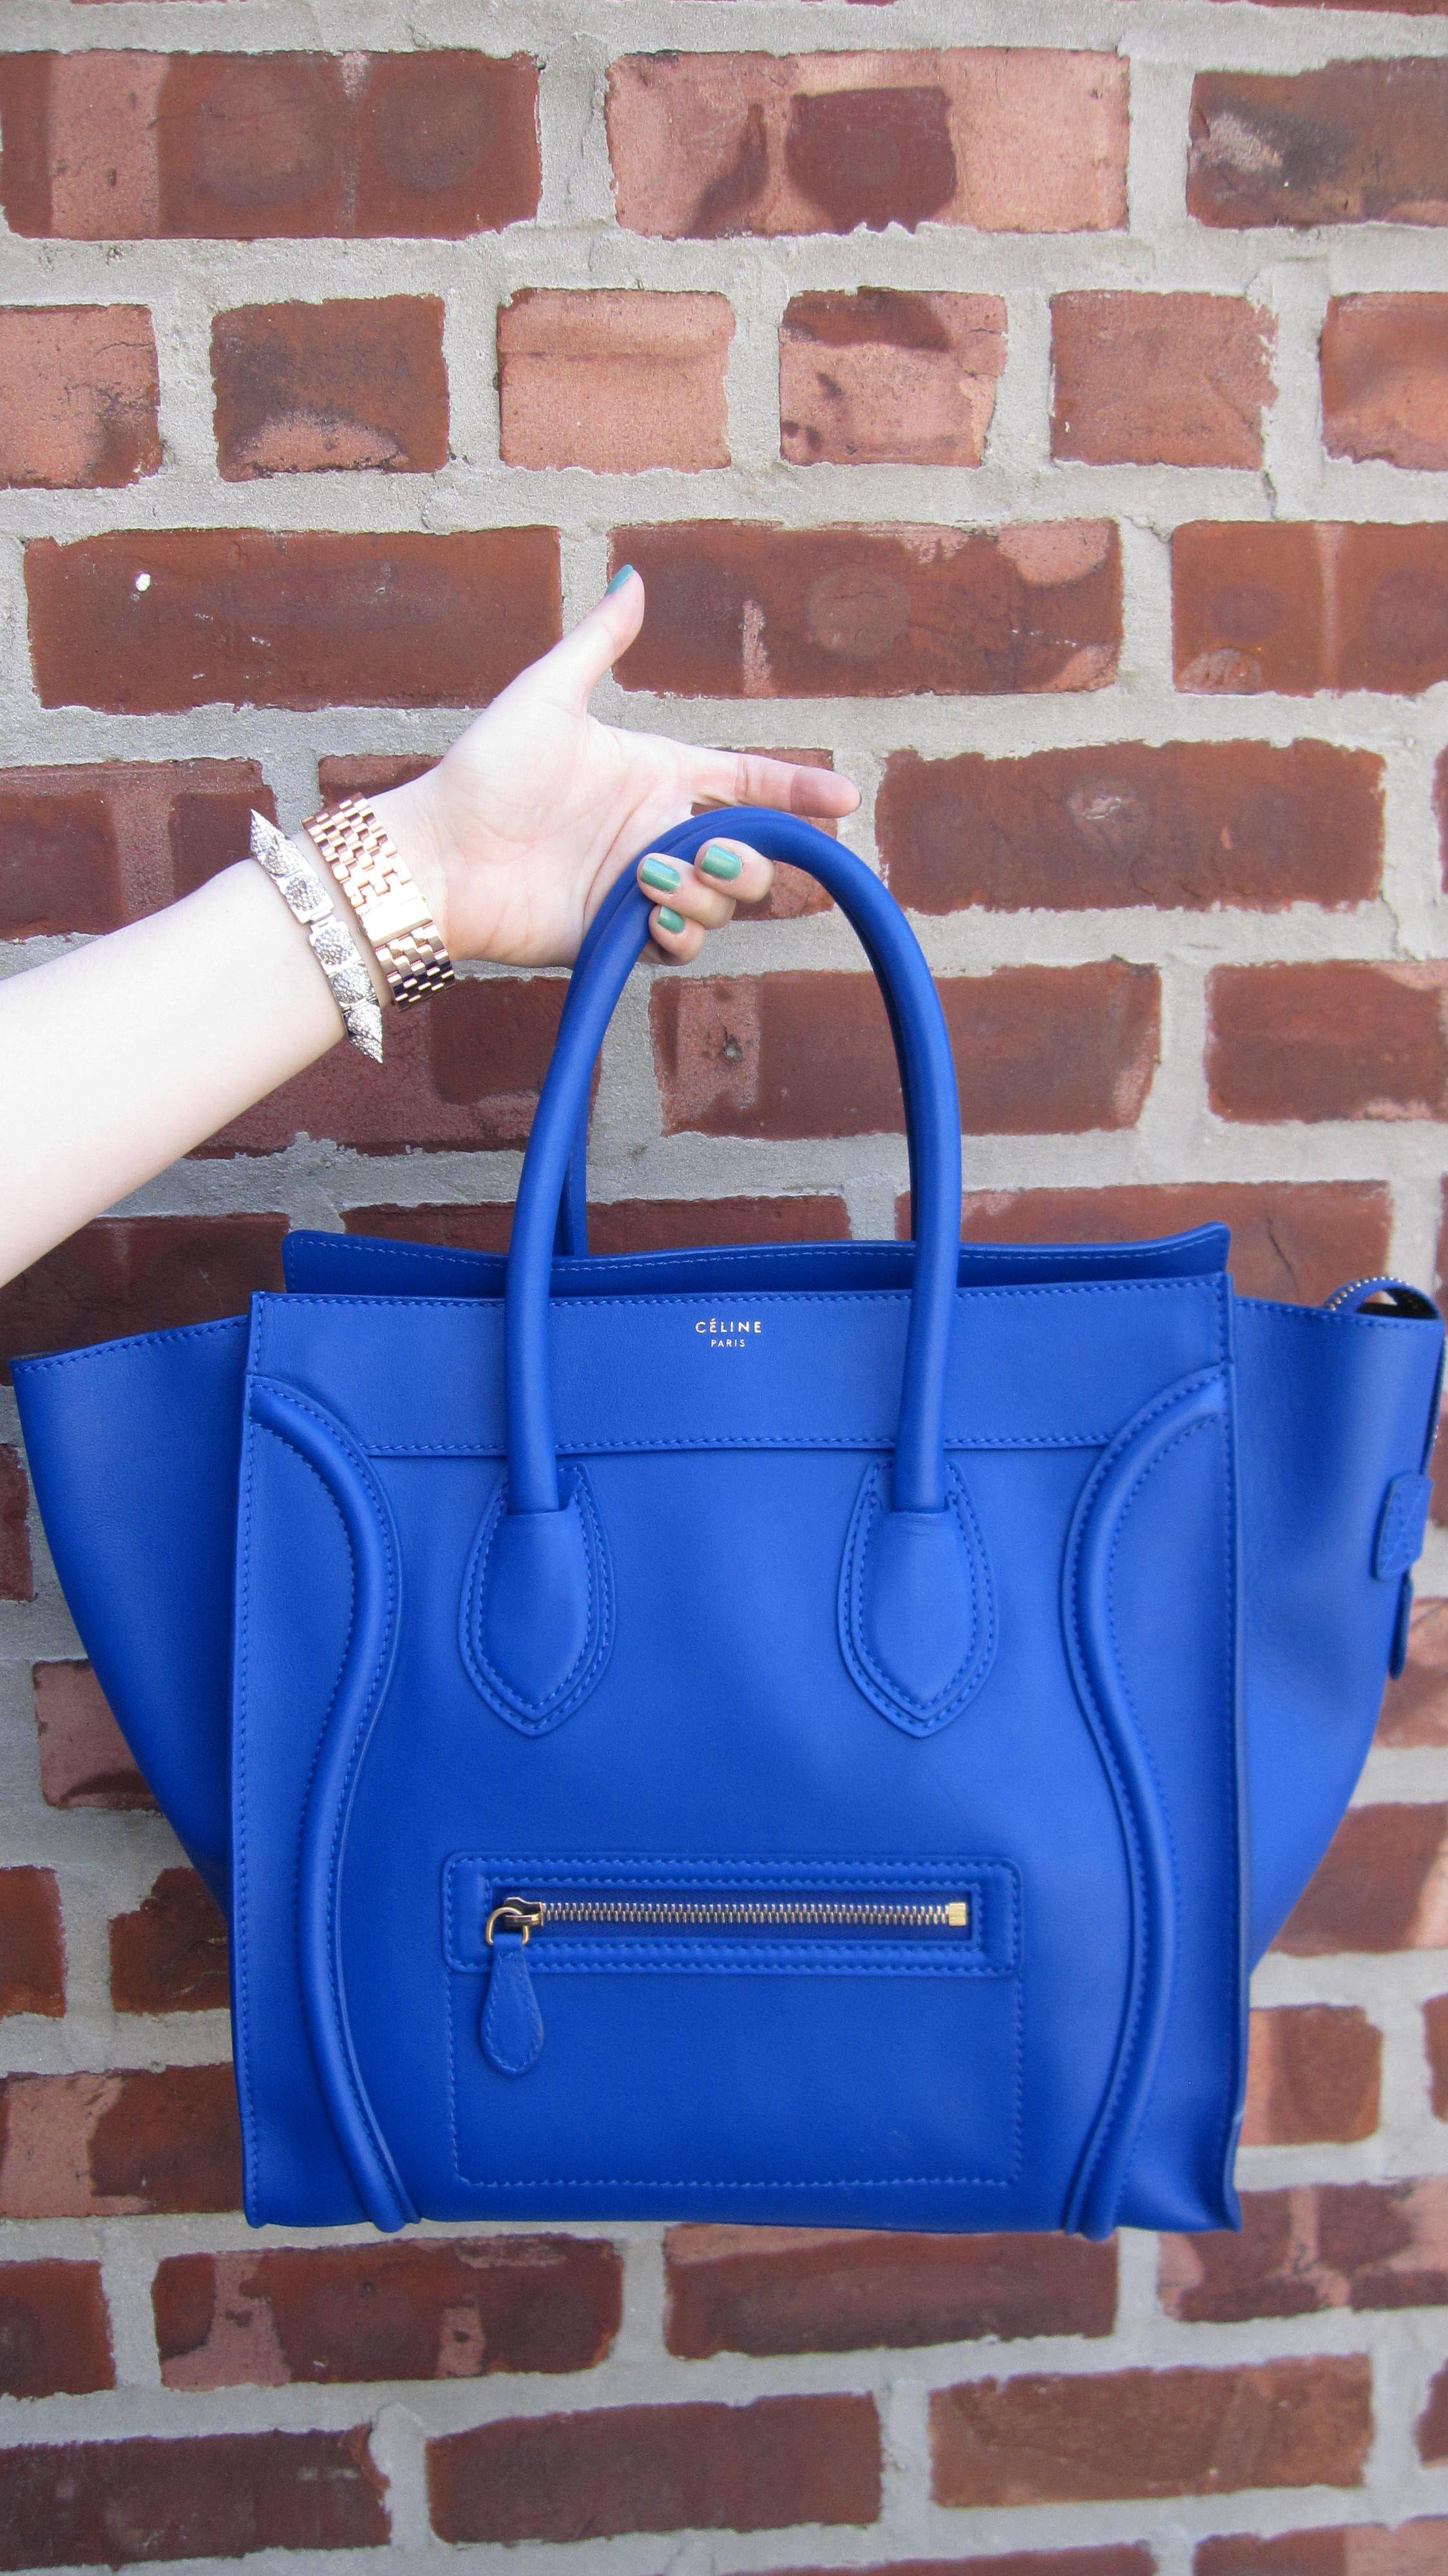 Celine Cobalt Blue Mini Luggage Tote The Fashion Minx